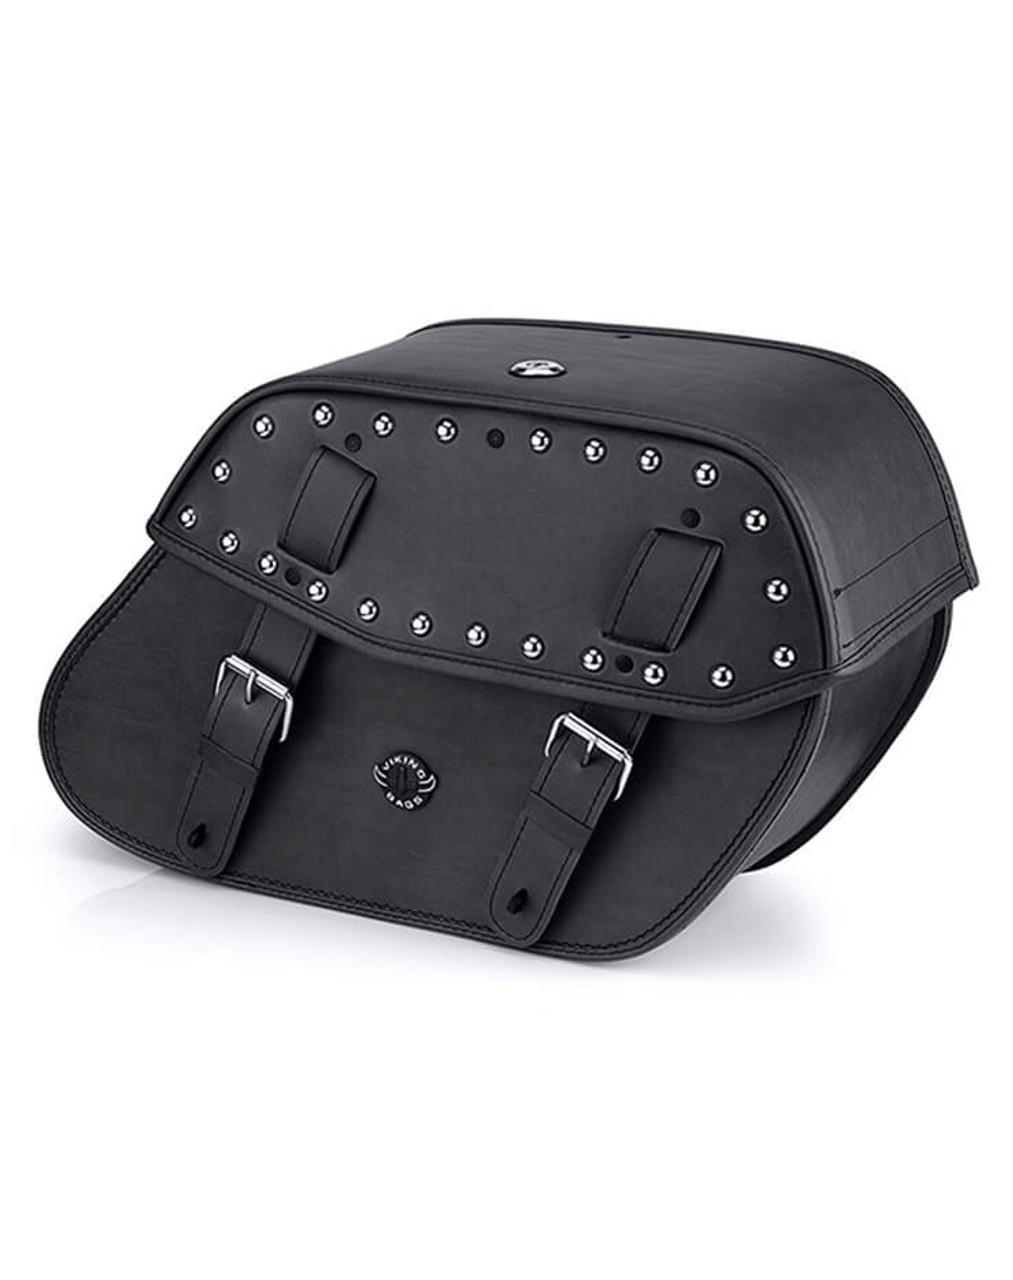 Honda 1500 Valkyrie Standard Viking Odin Studded Large Leather Motorcycle Saddlebags Main Bag View